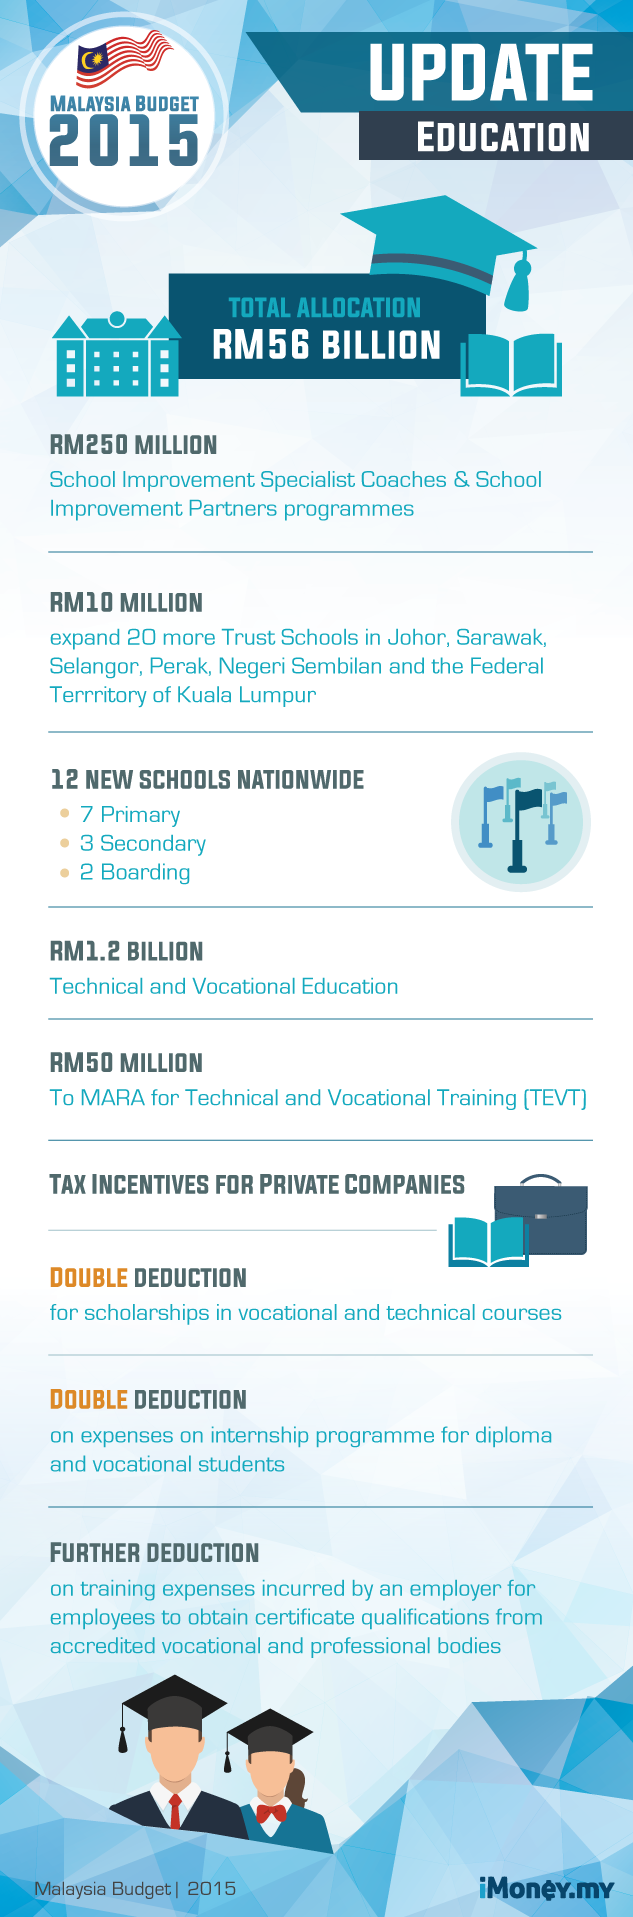 malaysias budget 2013 review